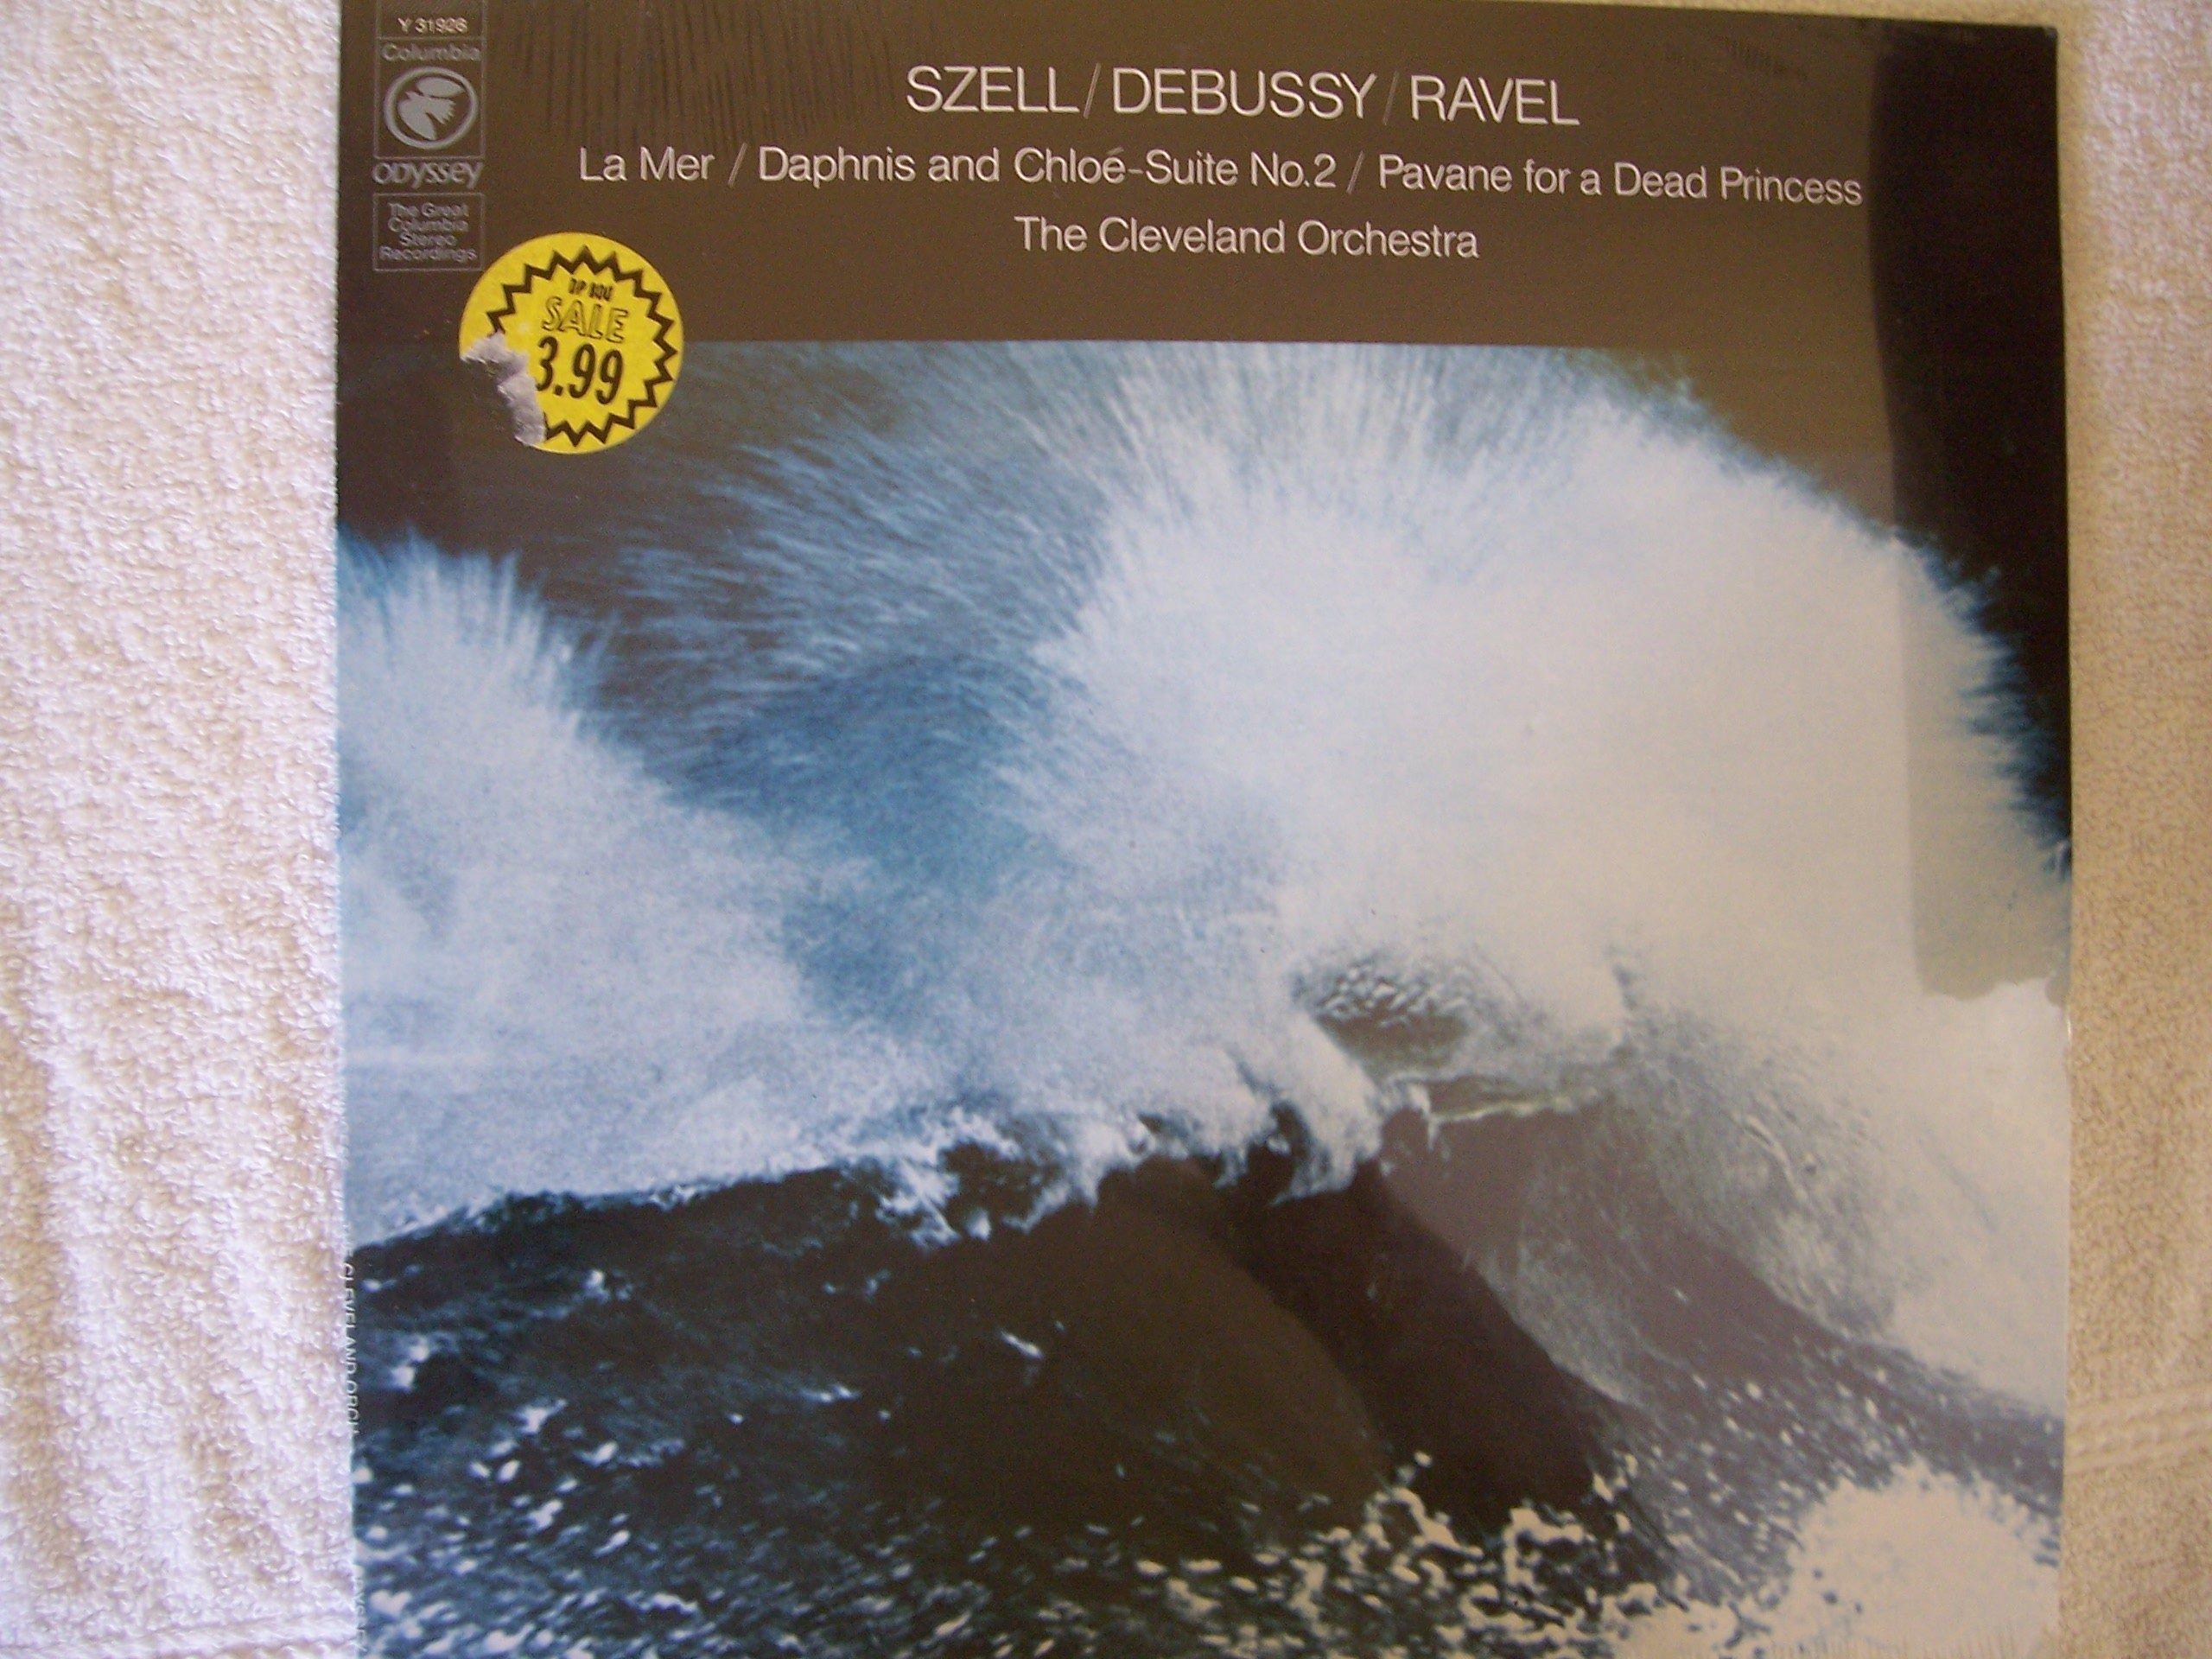 Szell / Debussy / Ravel: La Mer / Daphnis and Chloe-Suite No. 2 / Pavane for a Dead Princess